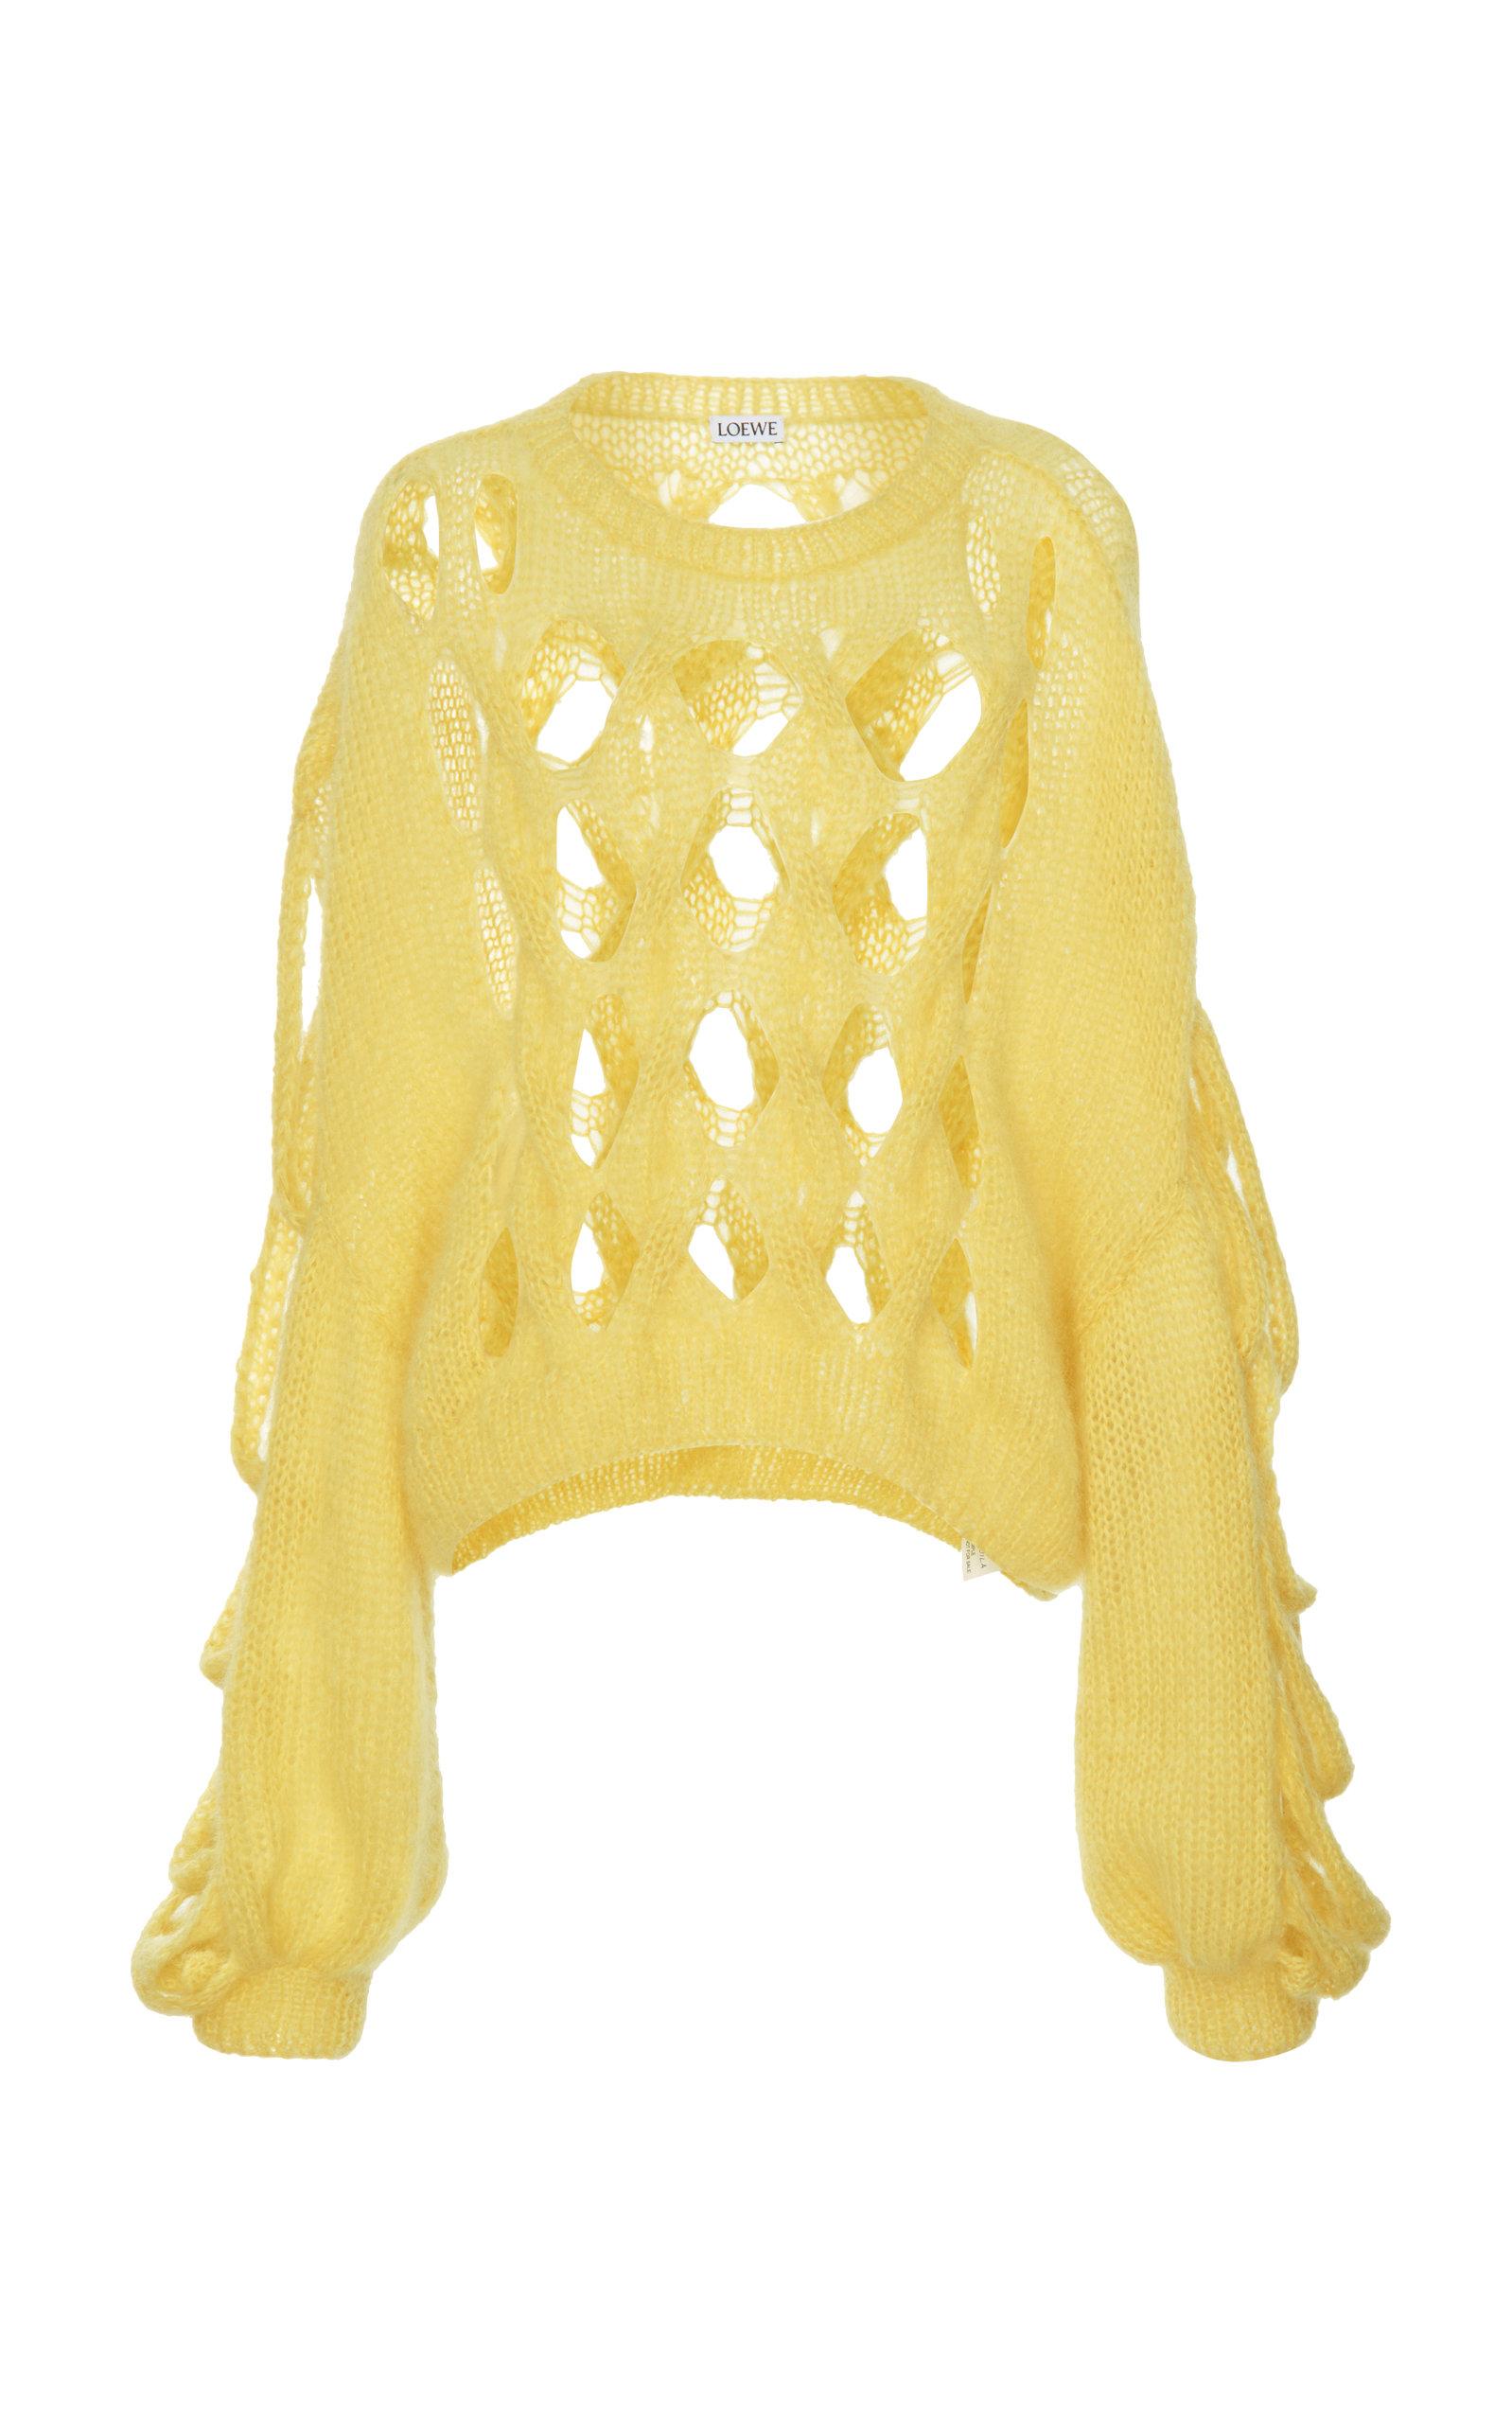 Loewe Knits Open-Knit Mohair Sweater